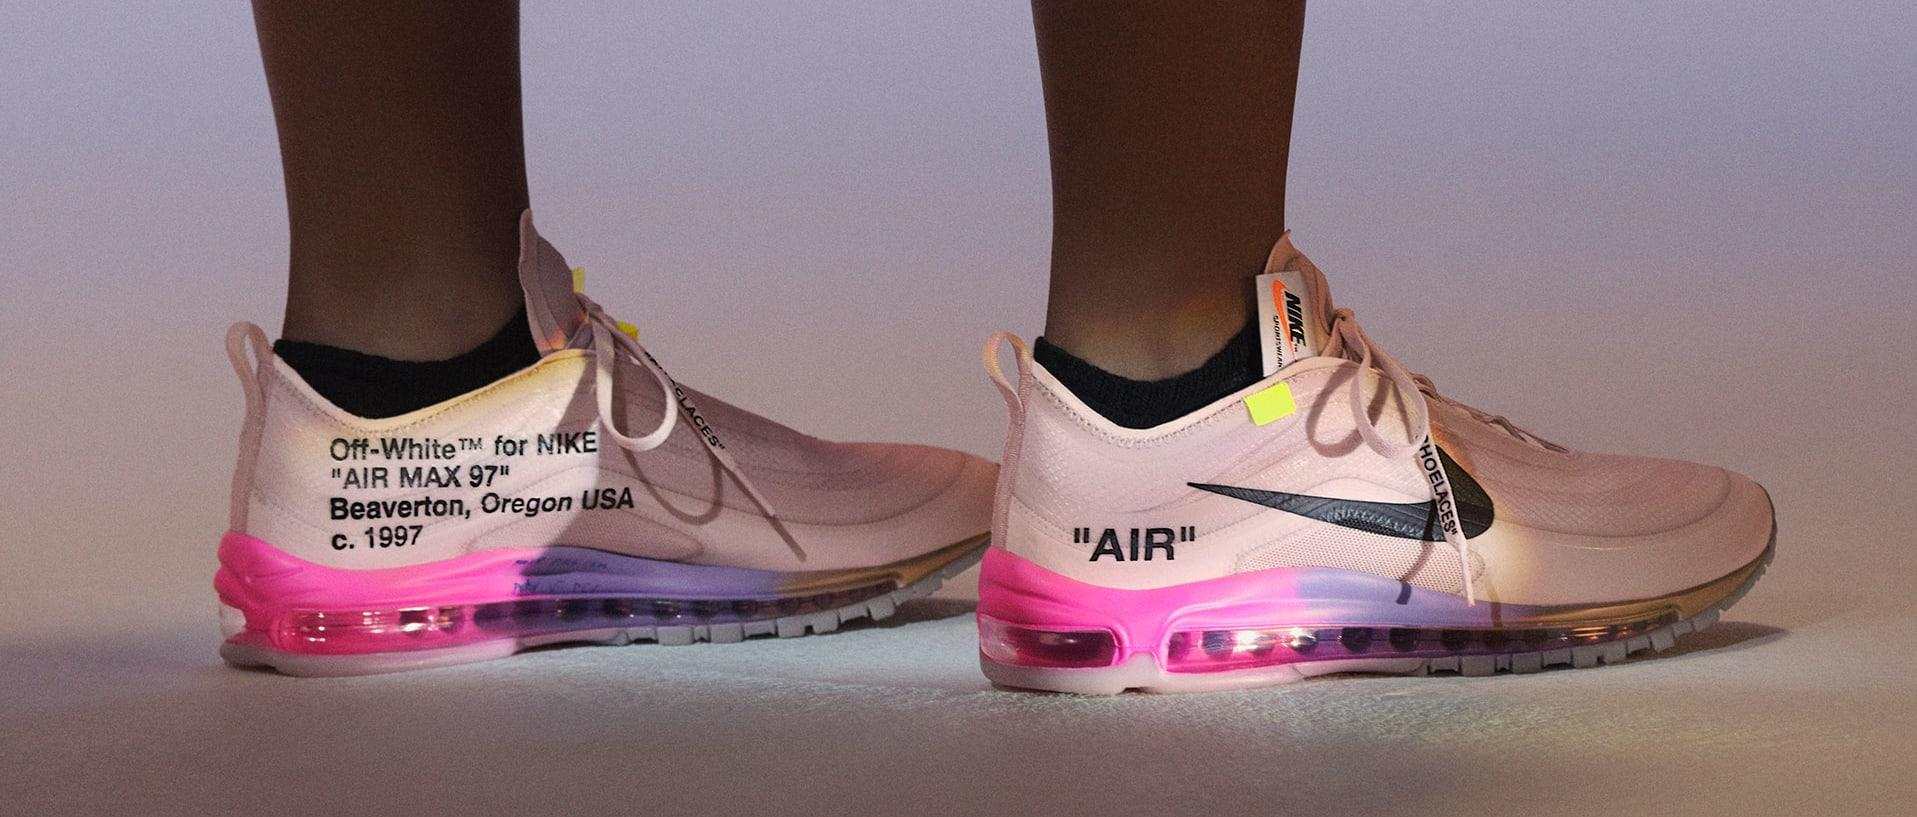 Virgil Abloh x Nike x Serena Williams Queen Collection Air Max 97